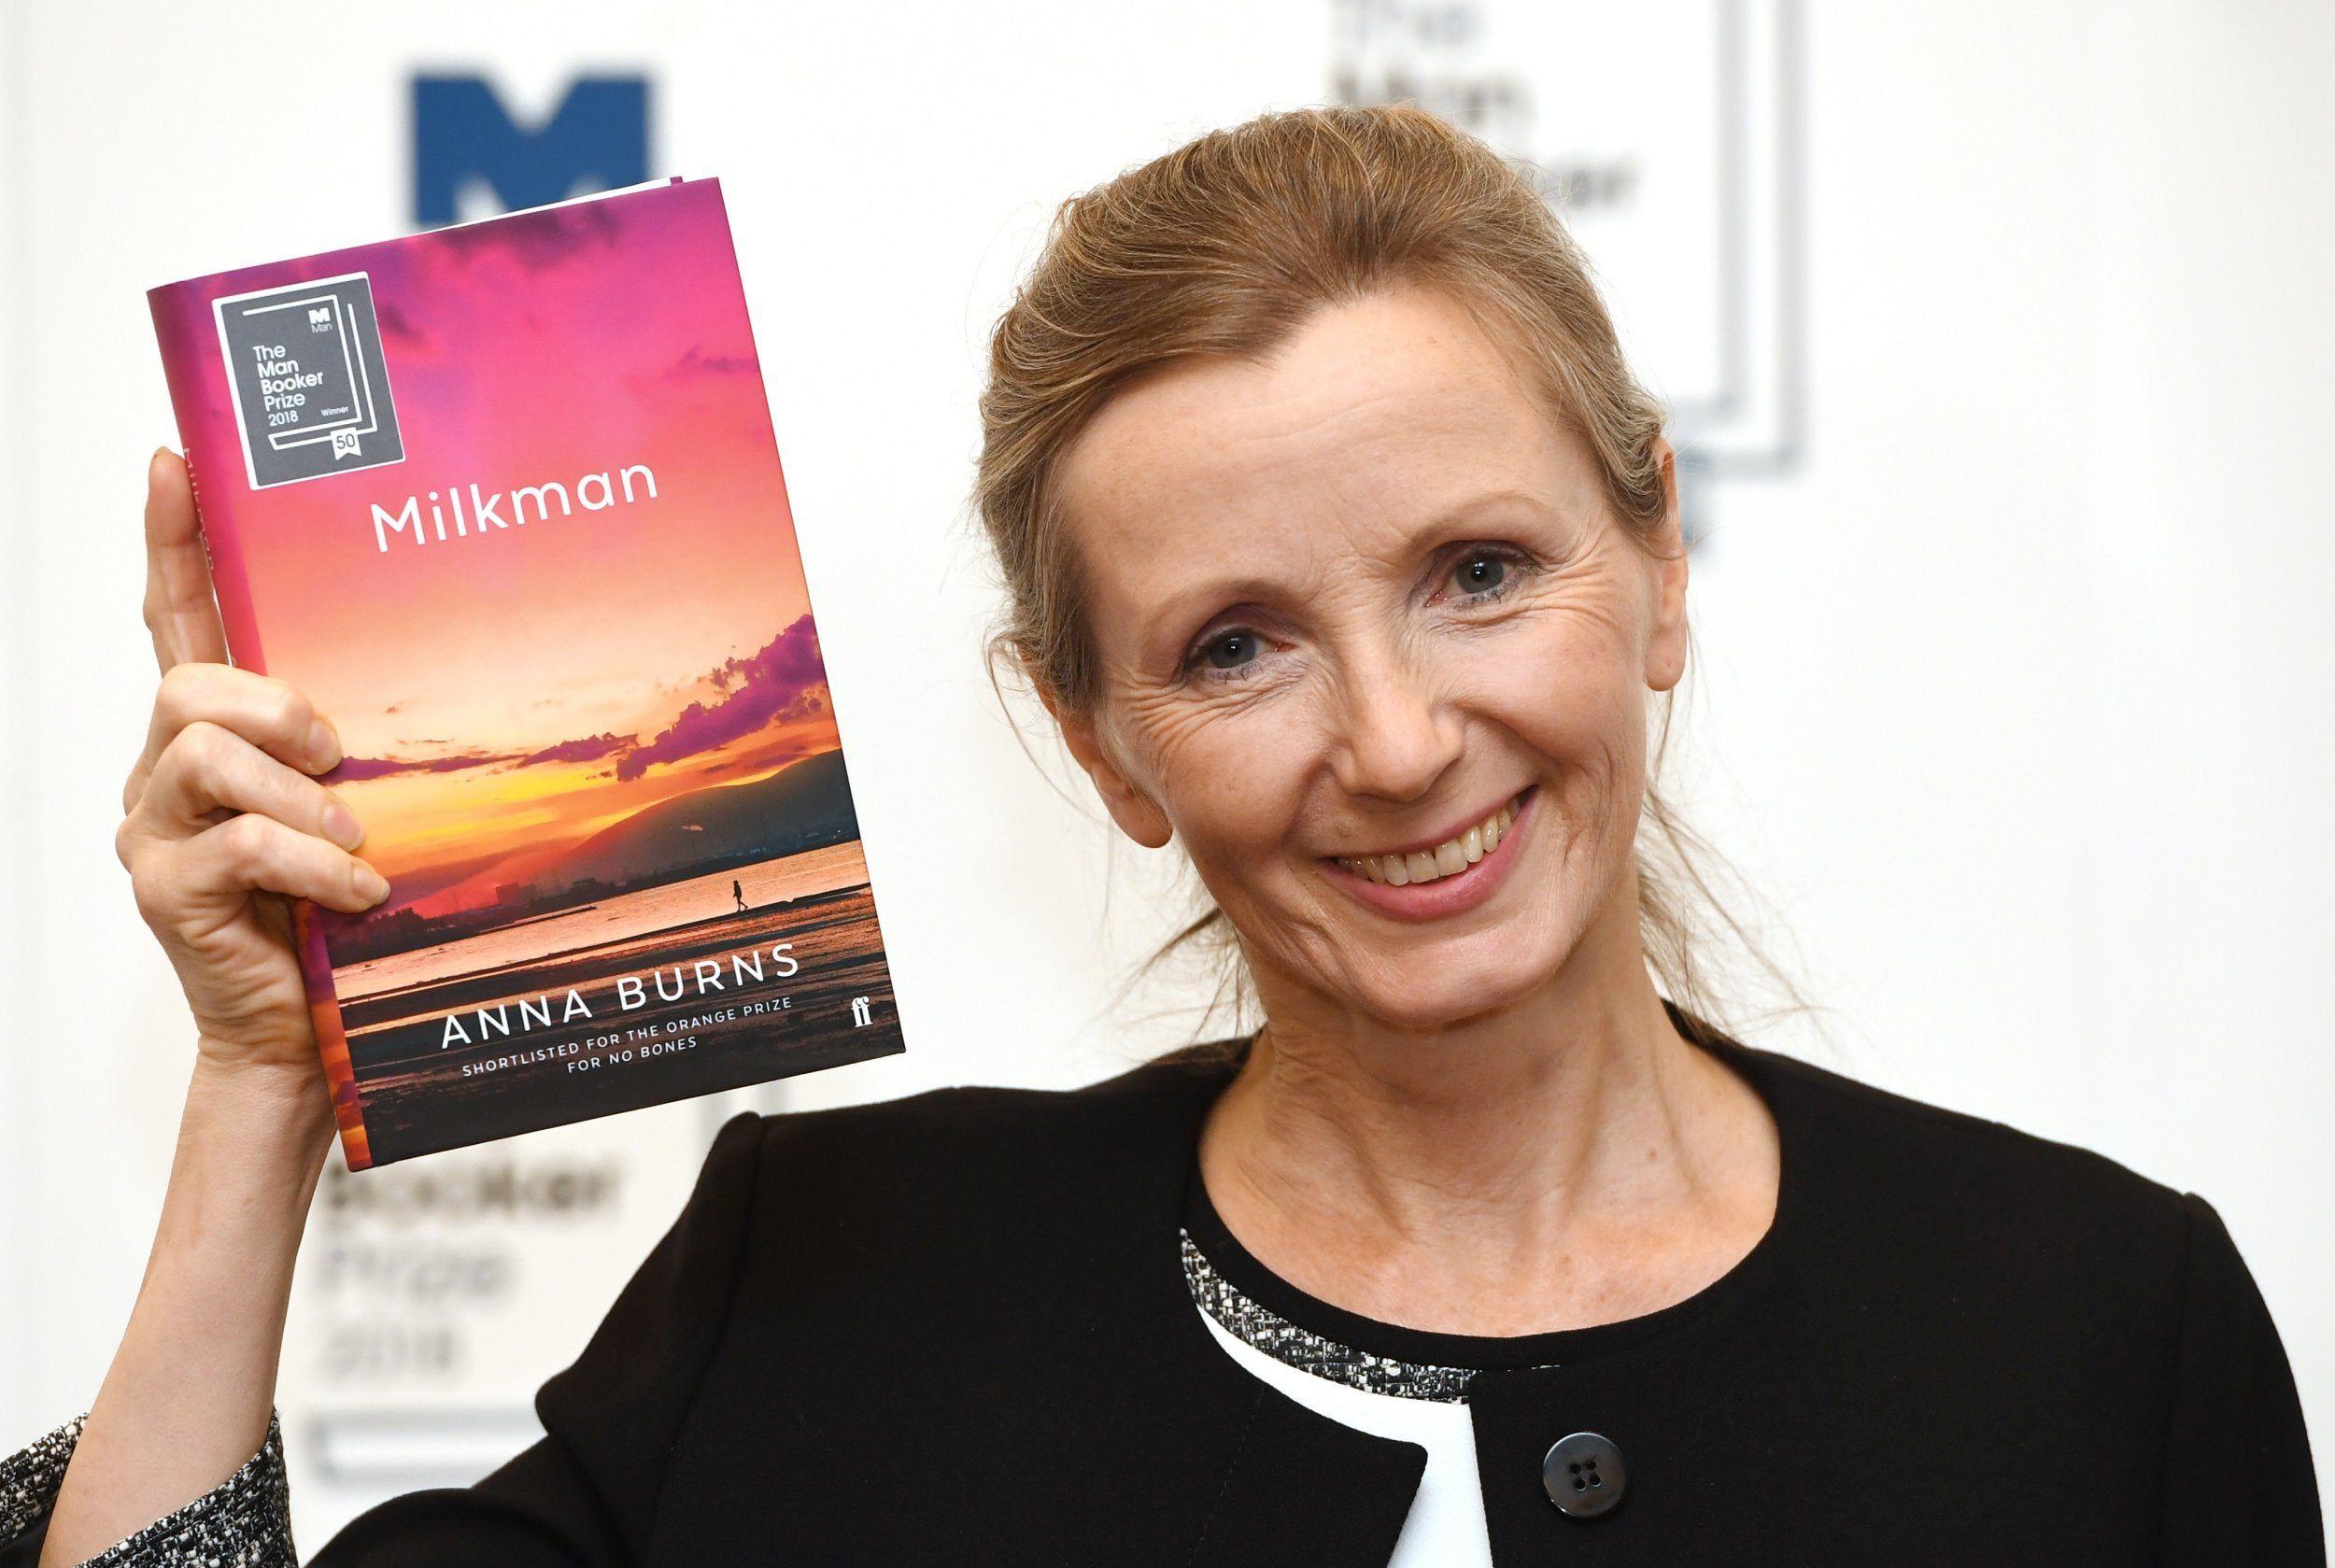 """Milkman"", de Anna Burns: #Metooem tempos bombistas"